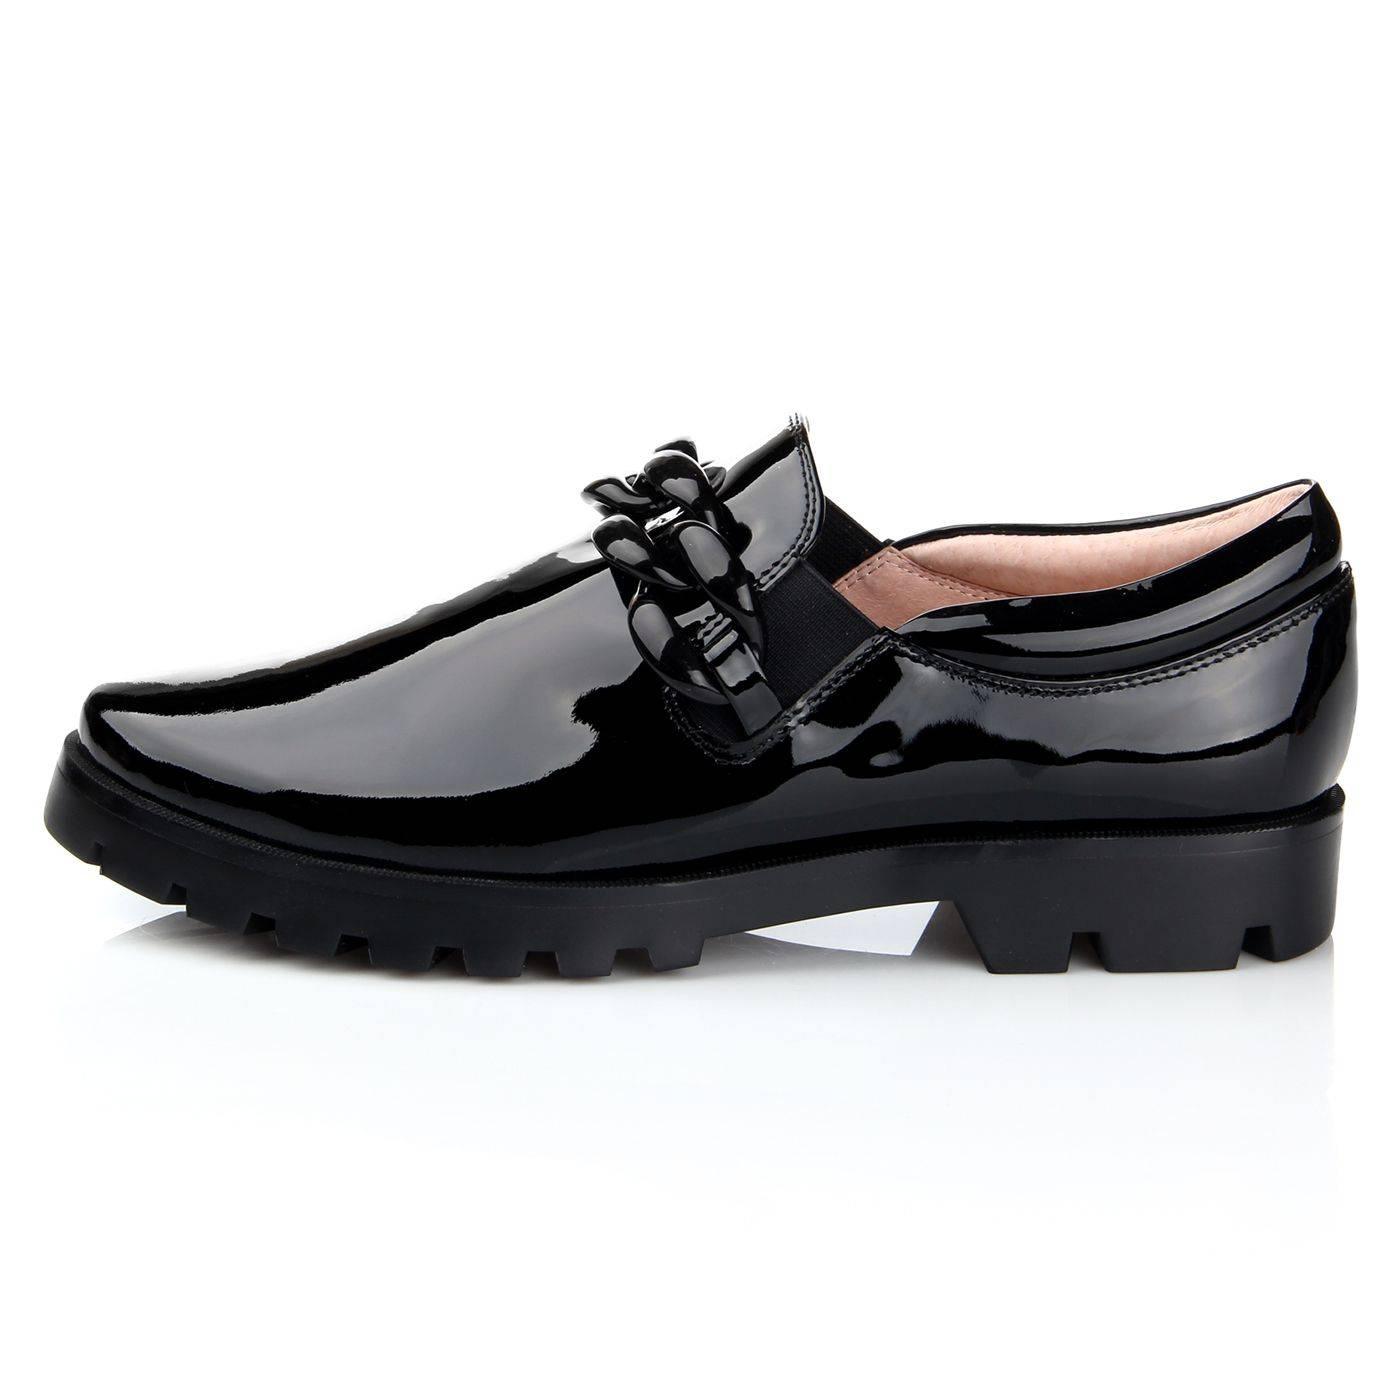 Туфлі жіночі basconi 1967 Чорний купить по выгодной цене в интернет ... 25a74537936fa